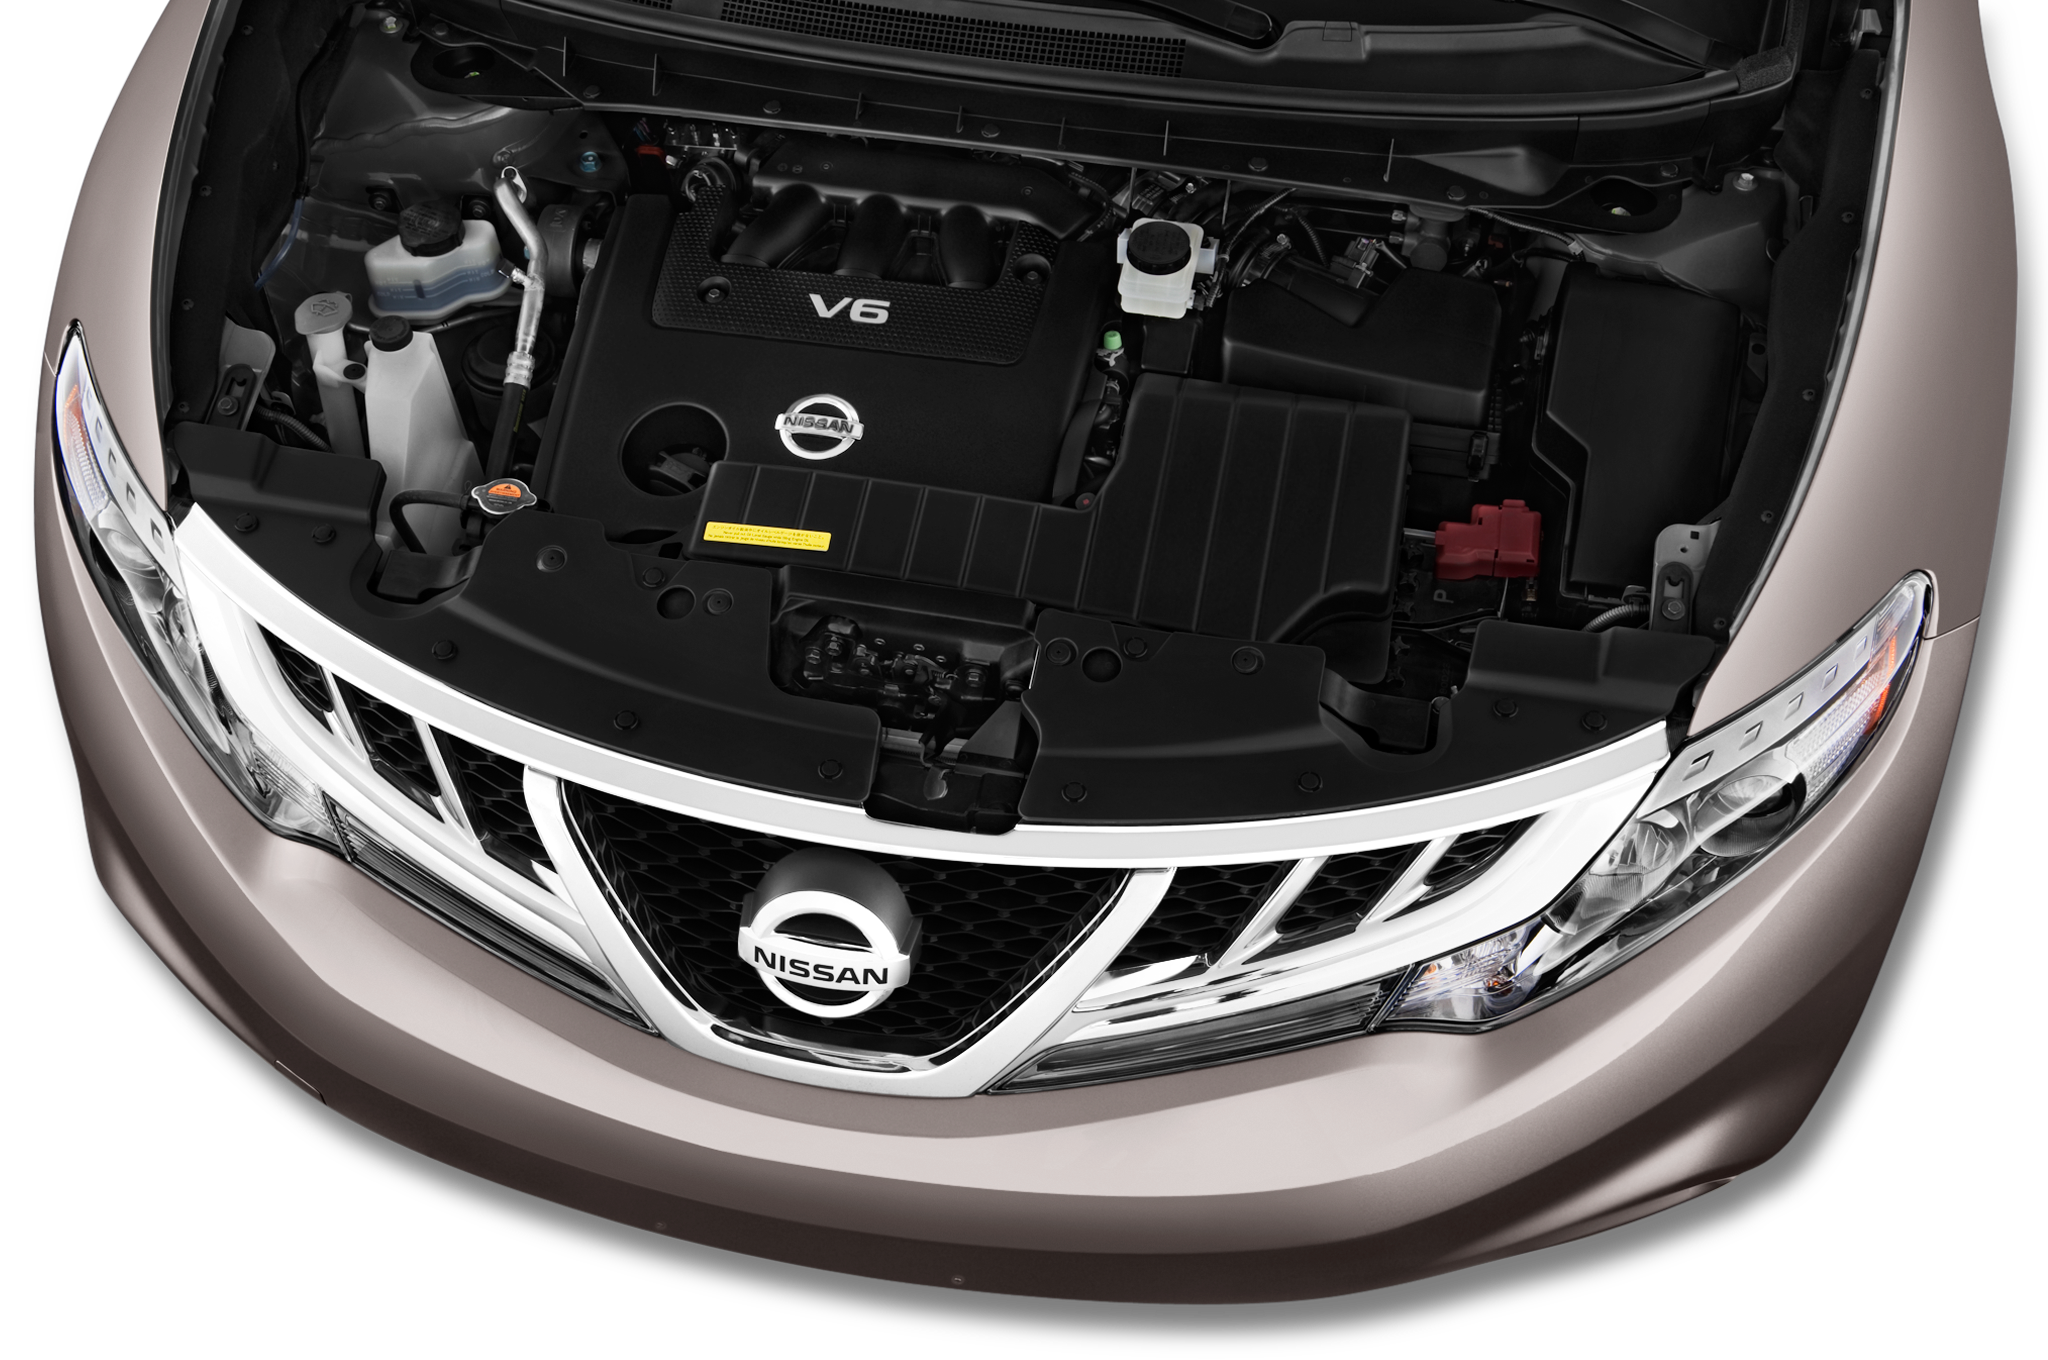 2012 Nissan Murano Le Awd Editors Notebook Automobile